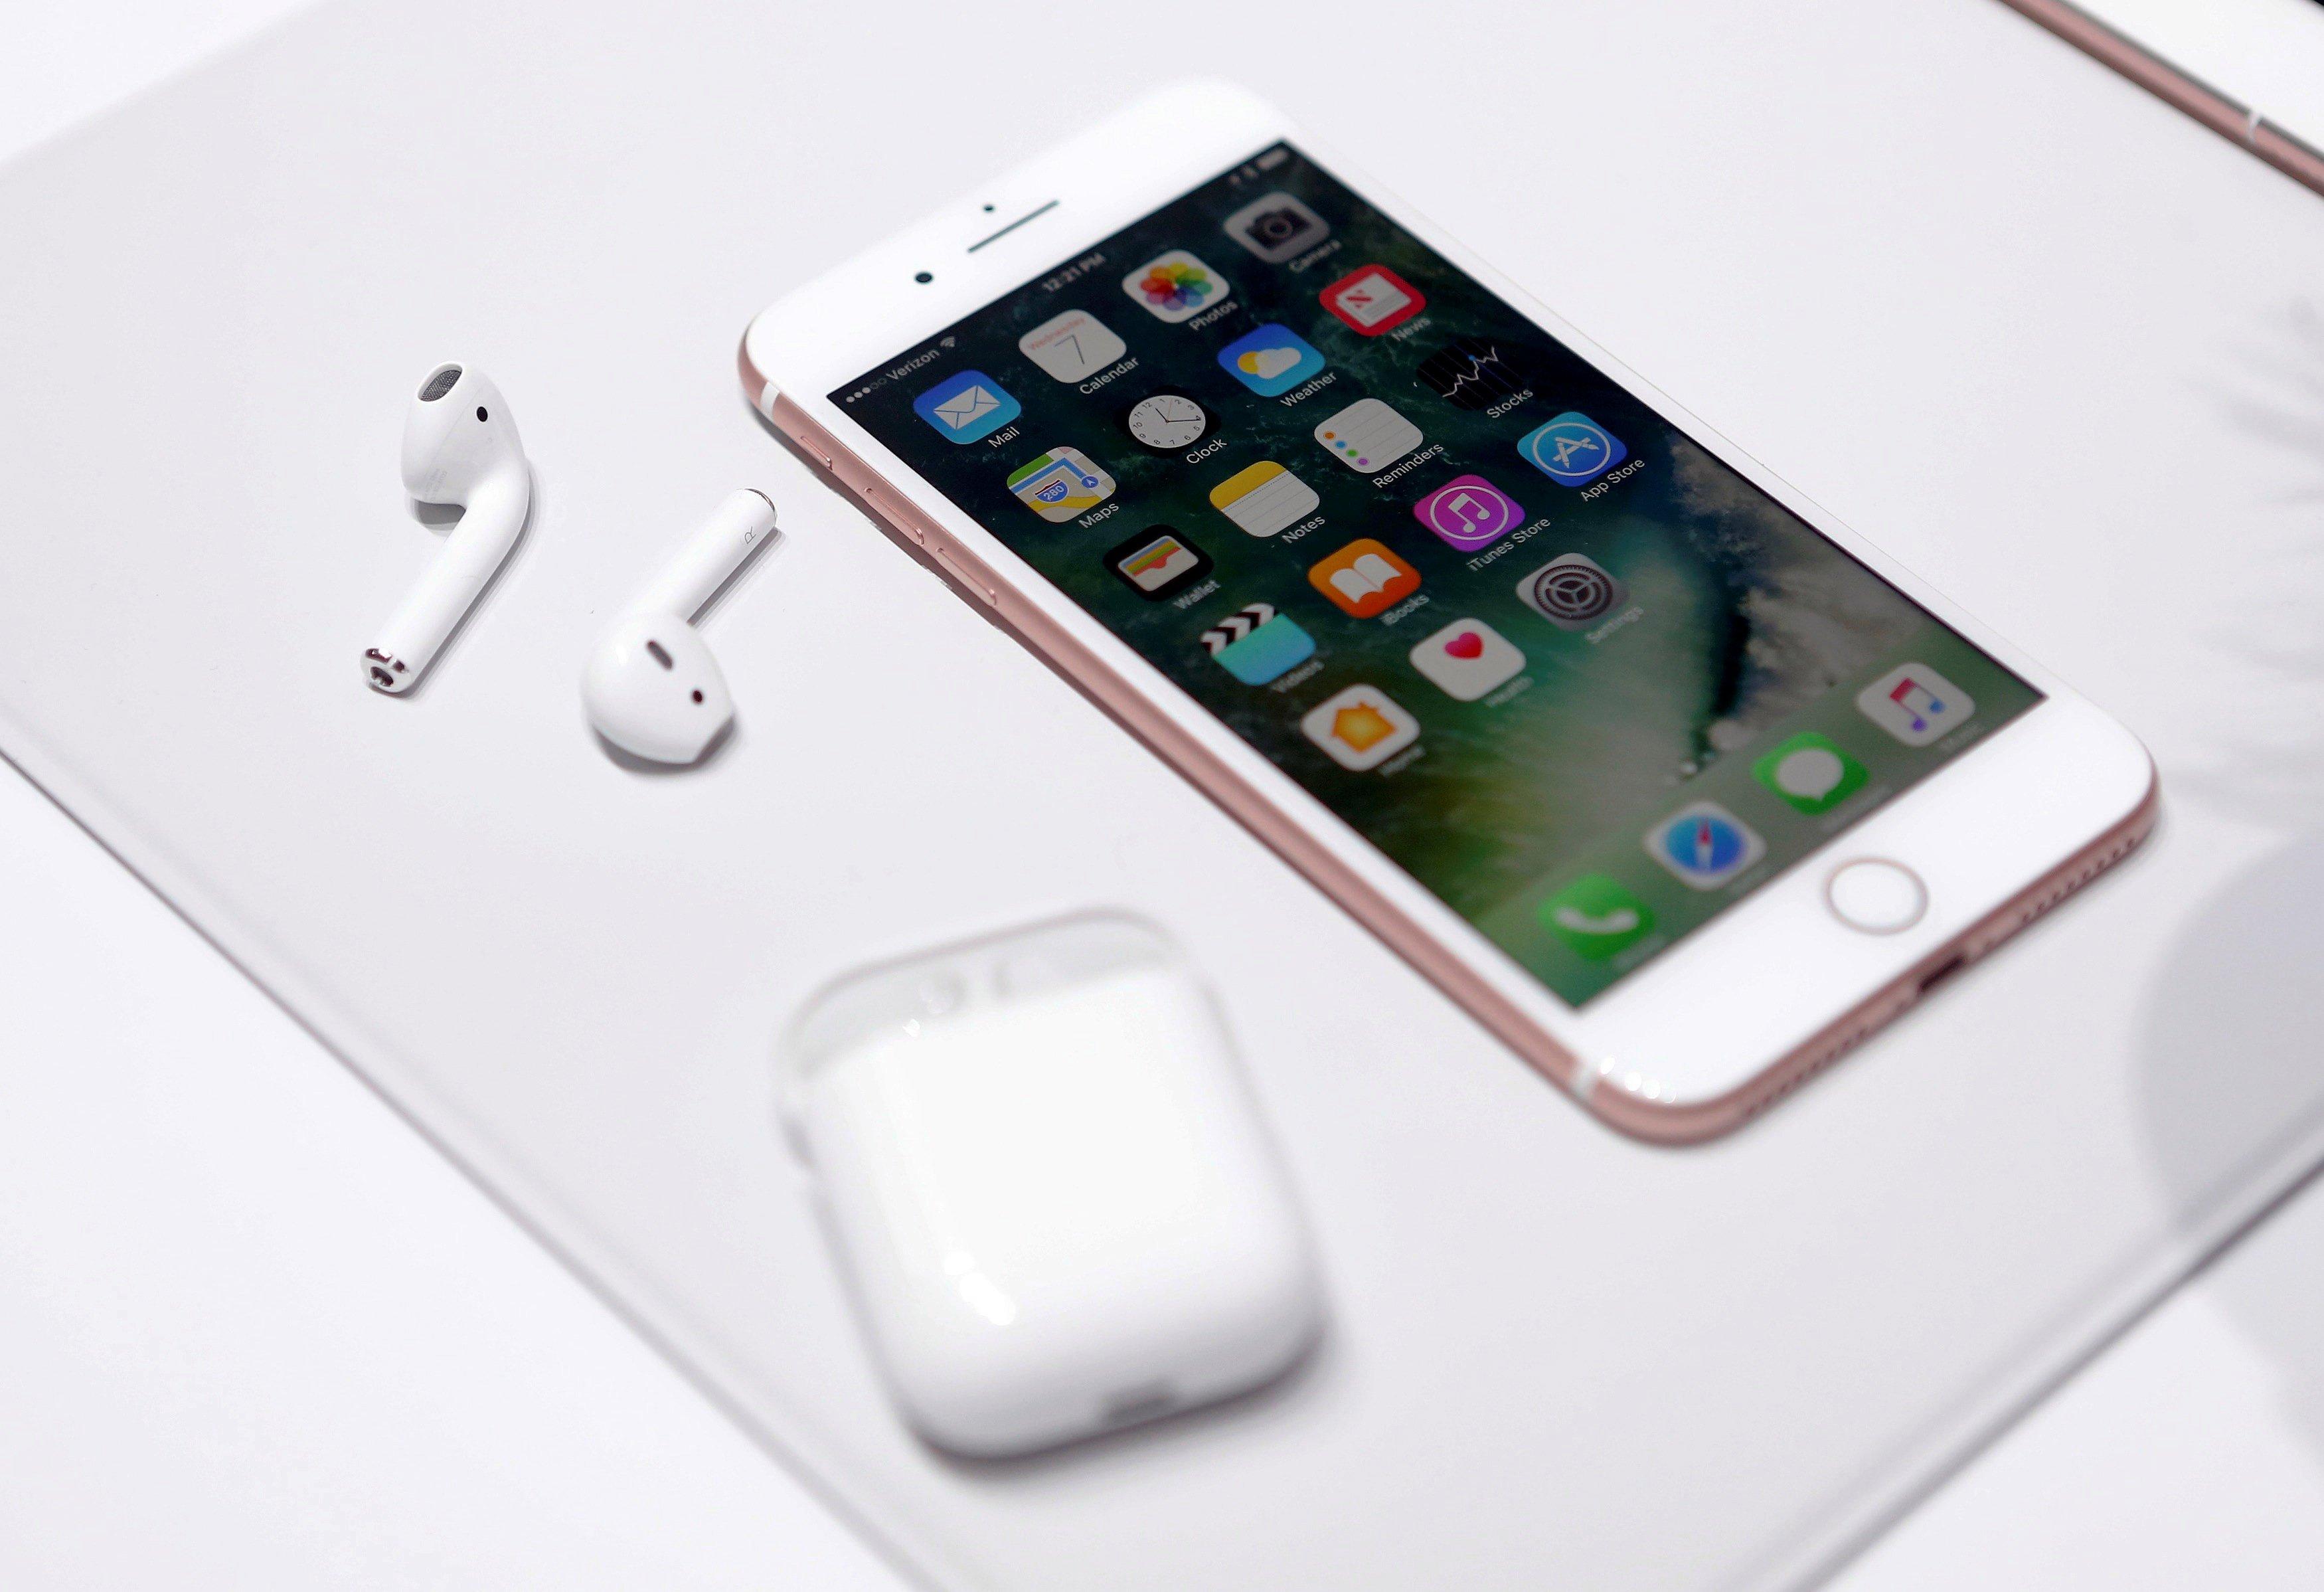 Airpods هي Appleسماعات الرأس اللاسلكية التي لا تحتاج إلى توصيلها